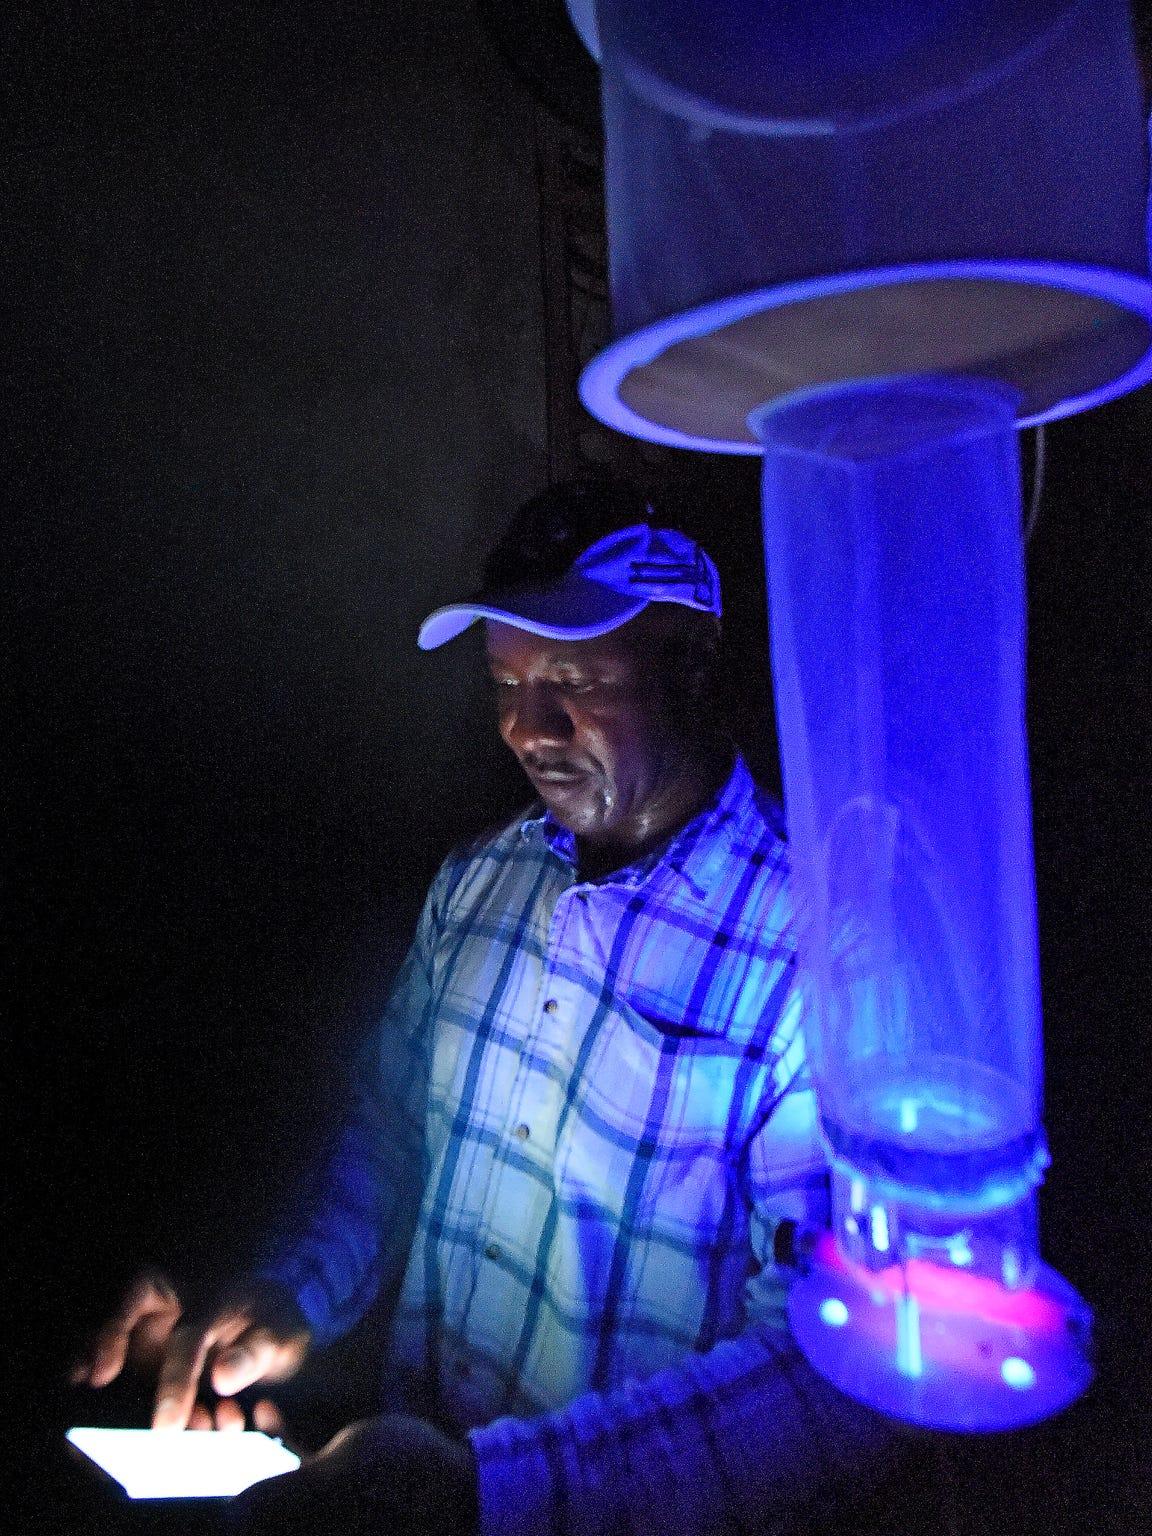 Dr. Bernard Okech checks his phone as he sets mosquito